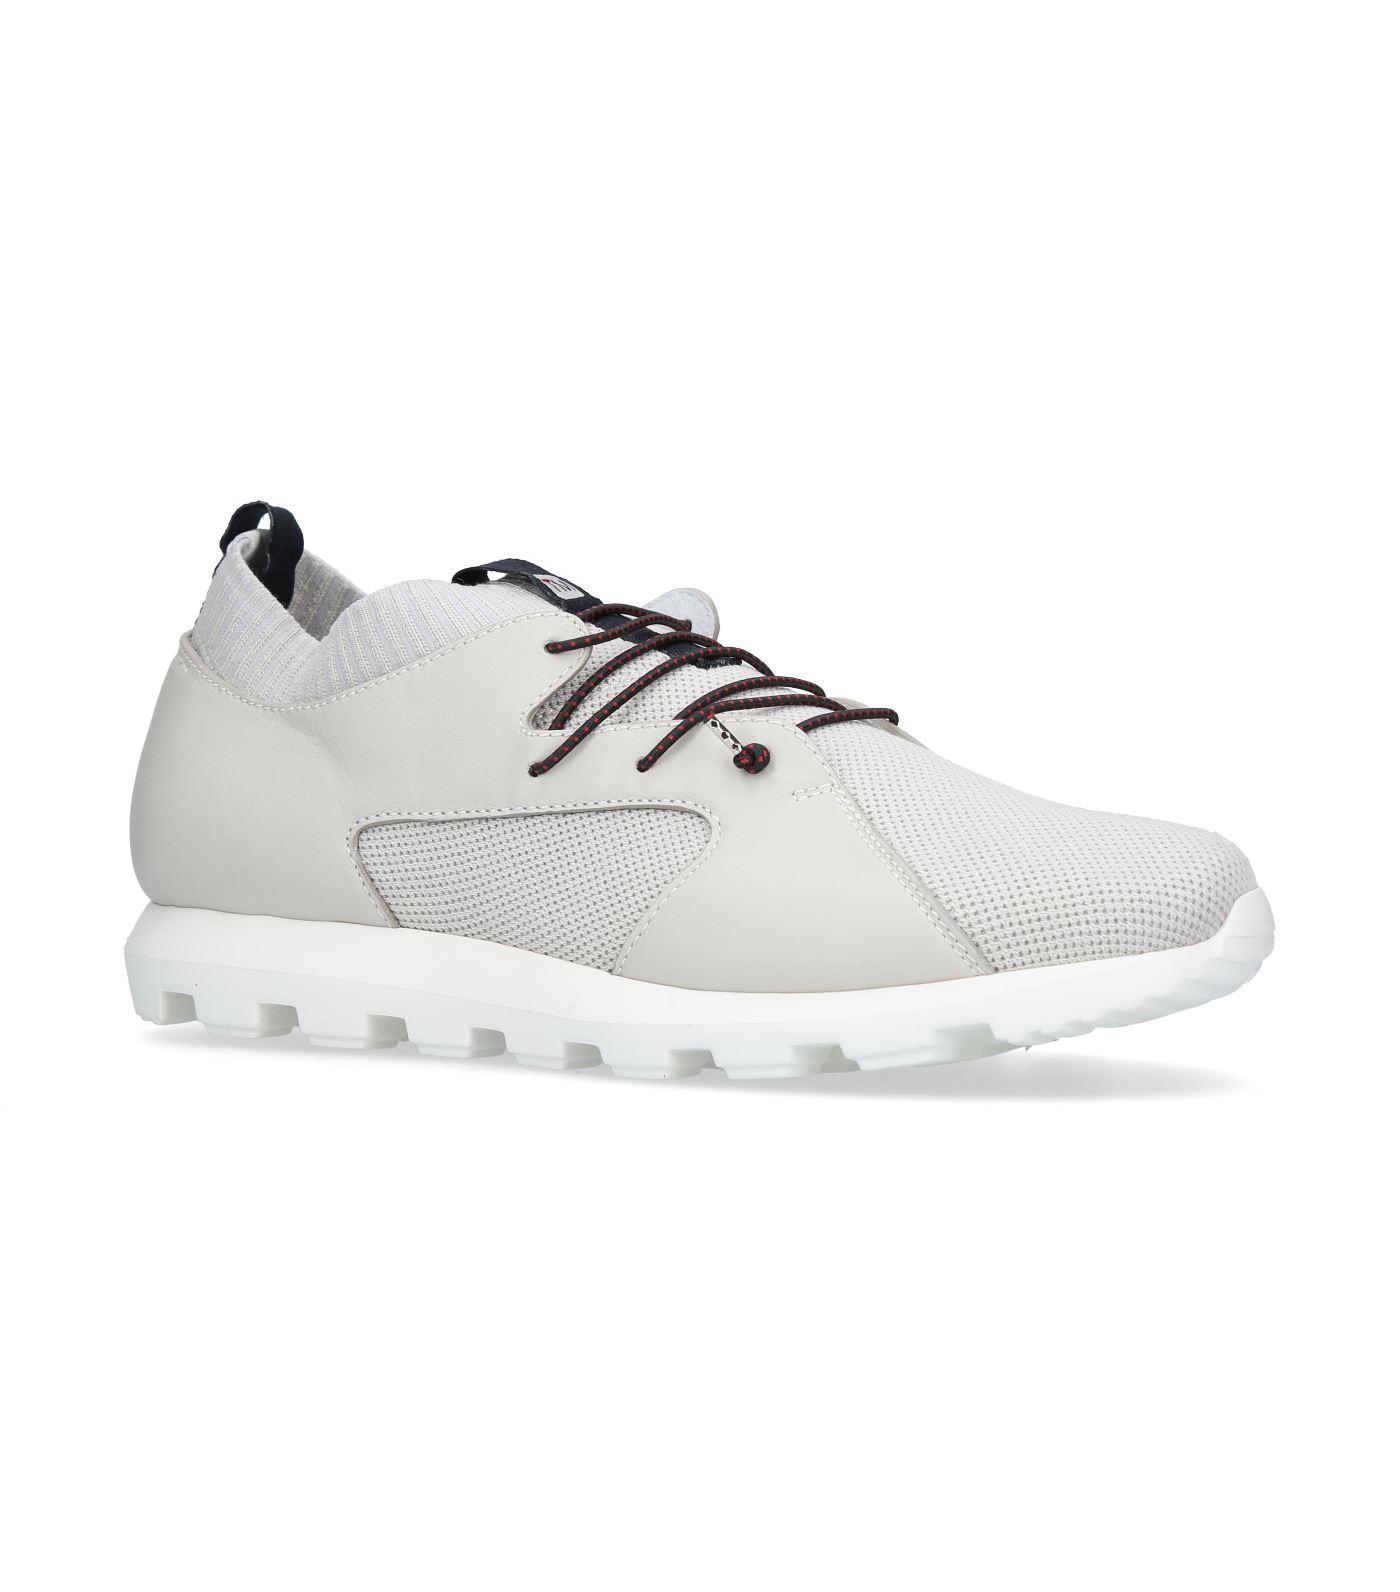 Ermenegildo Zegna Technomerino Lite Sneakers In Beige